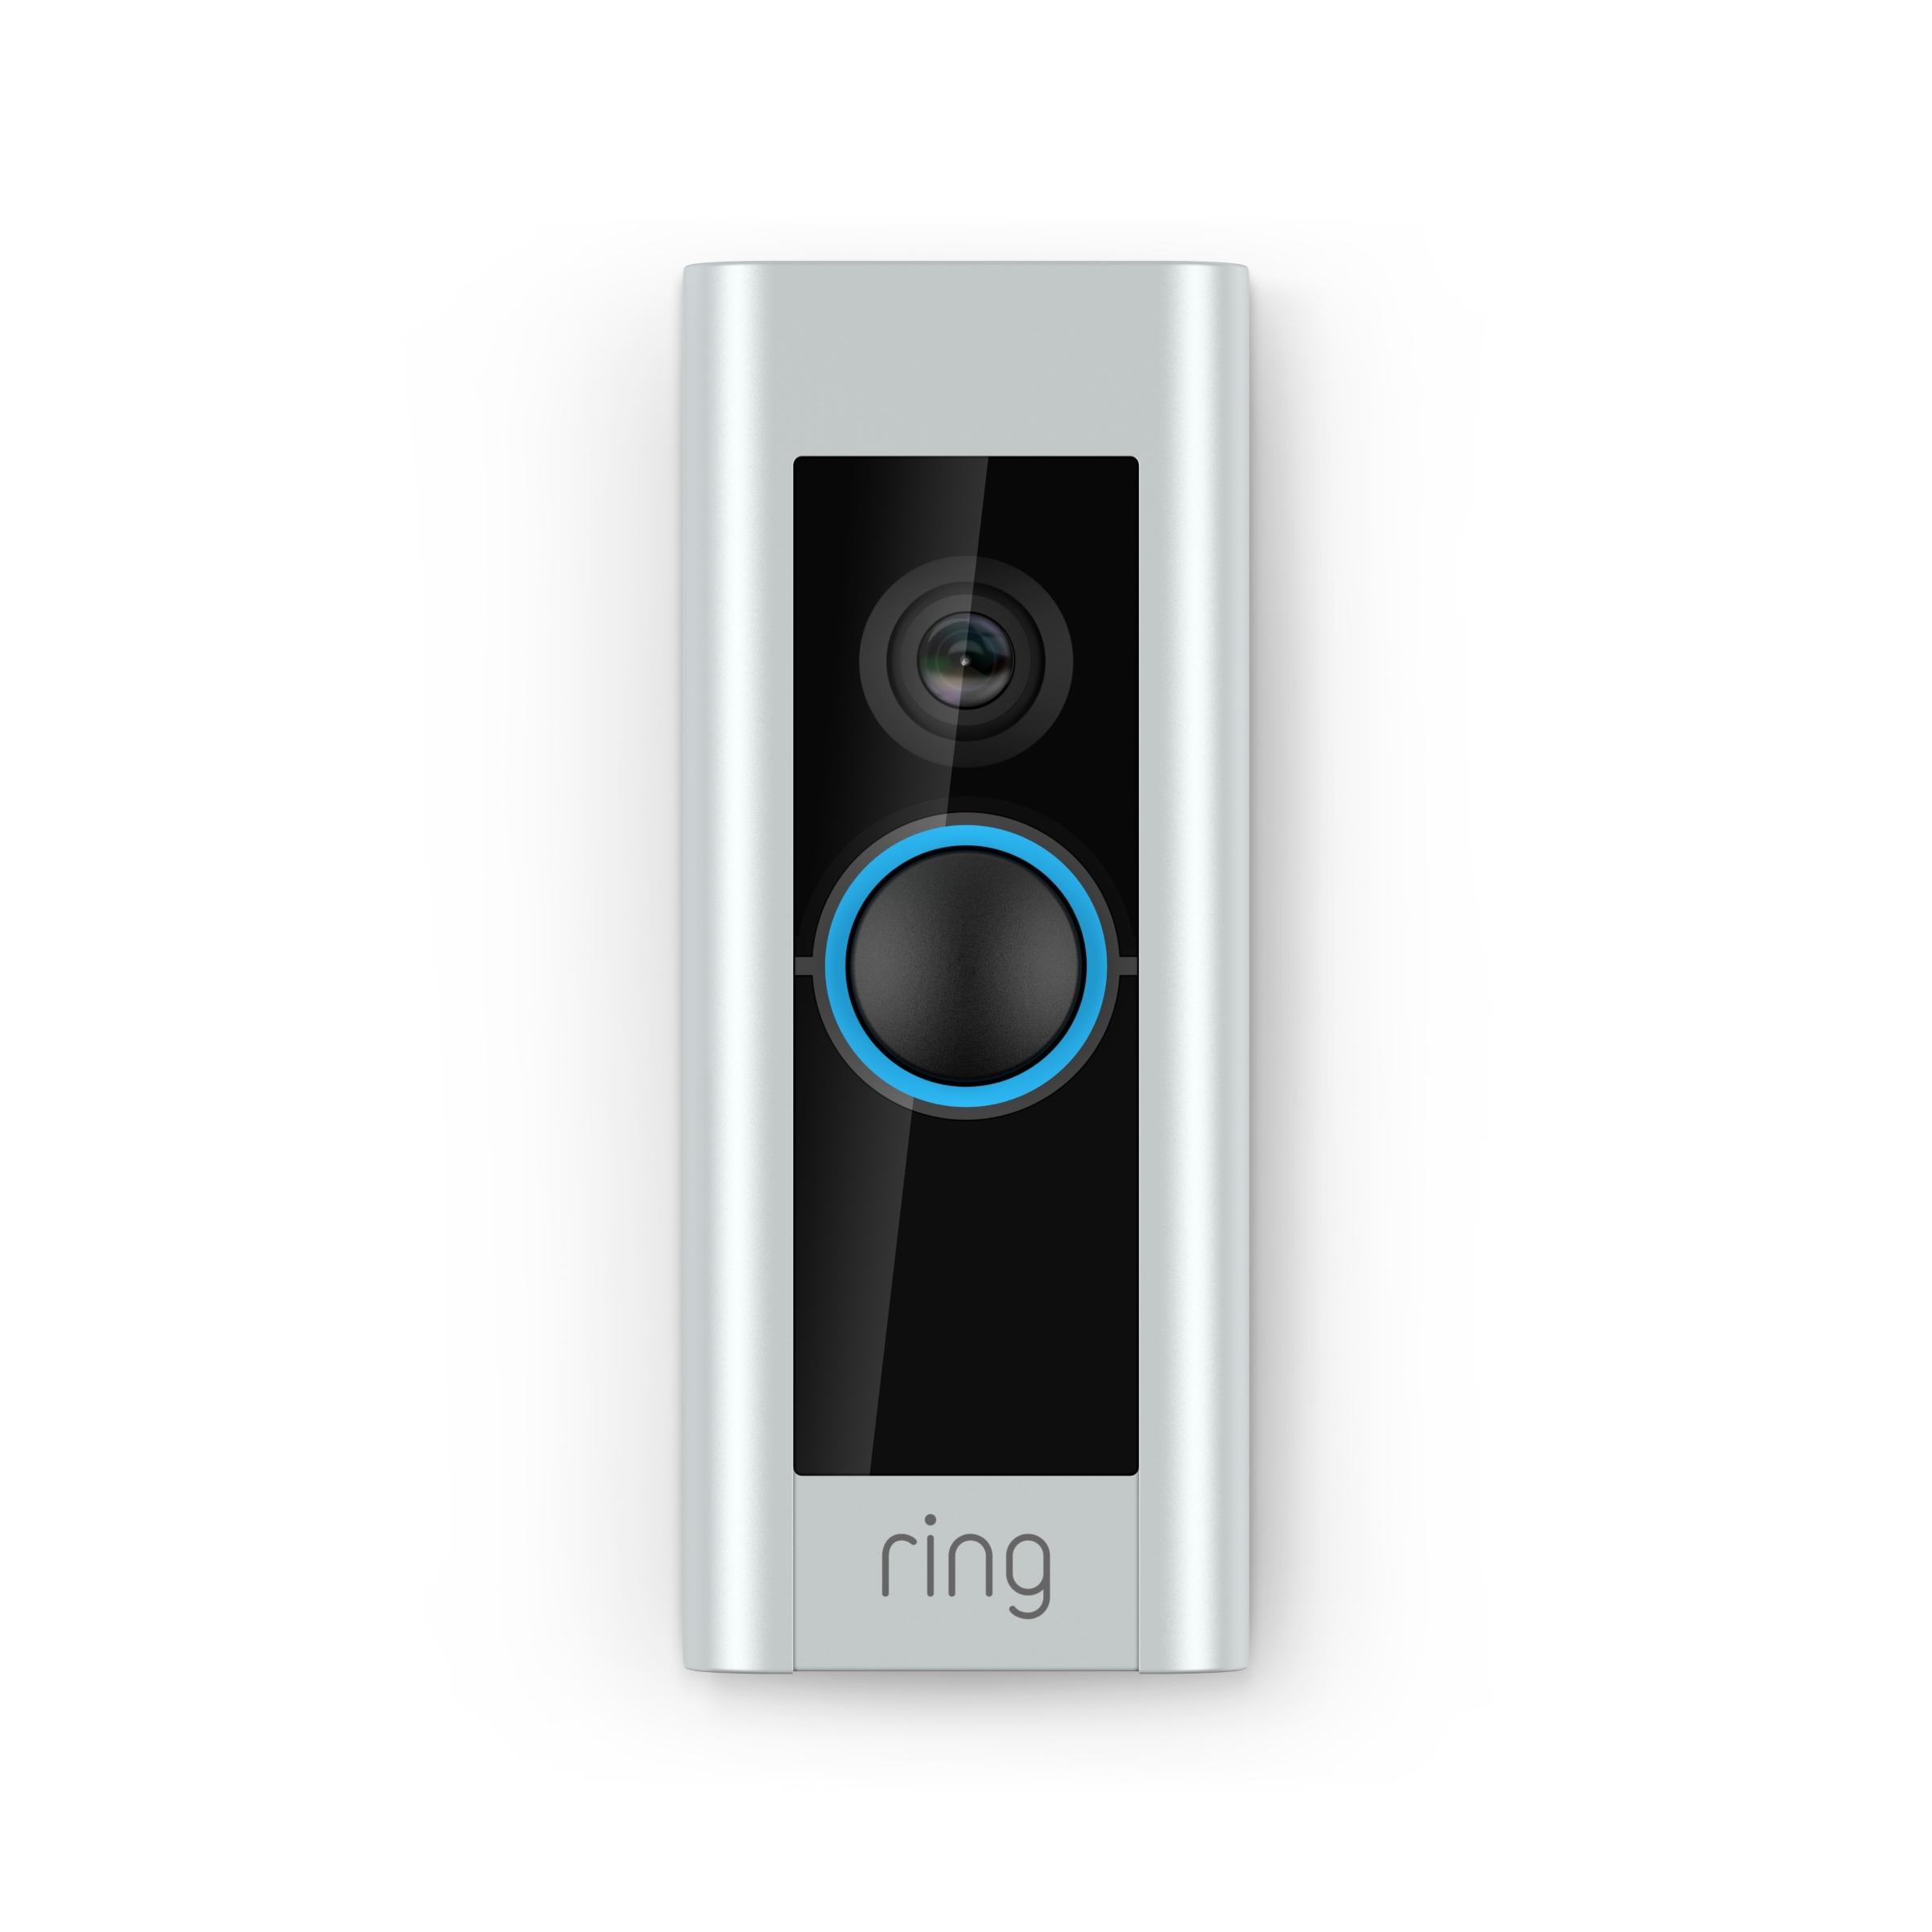 ring | eBay Stores